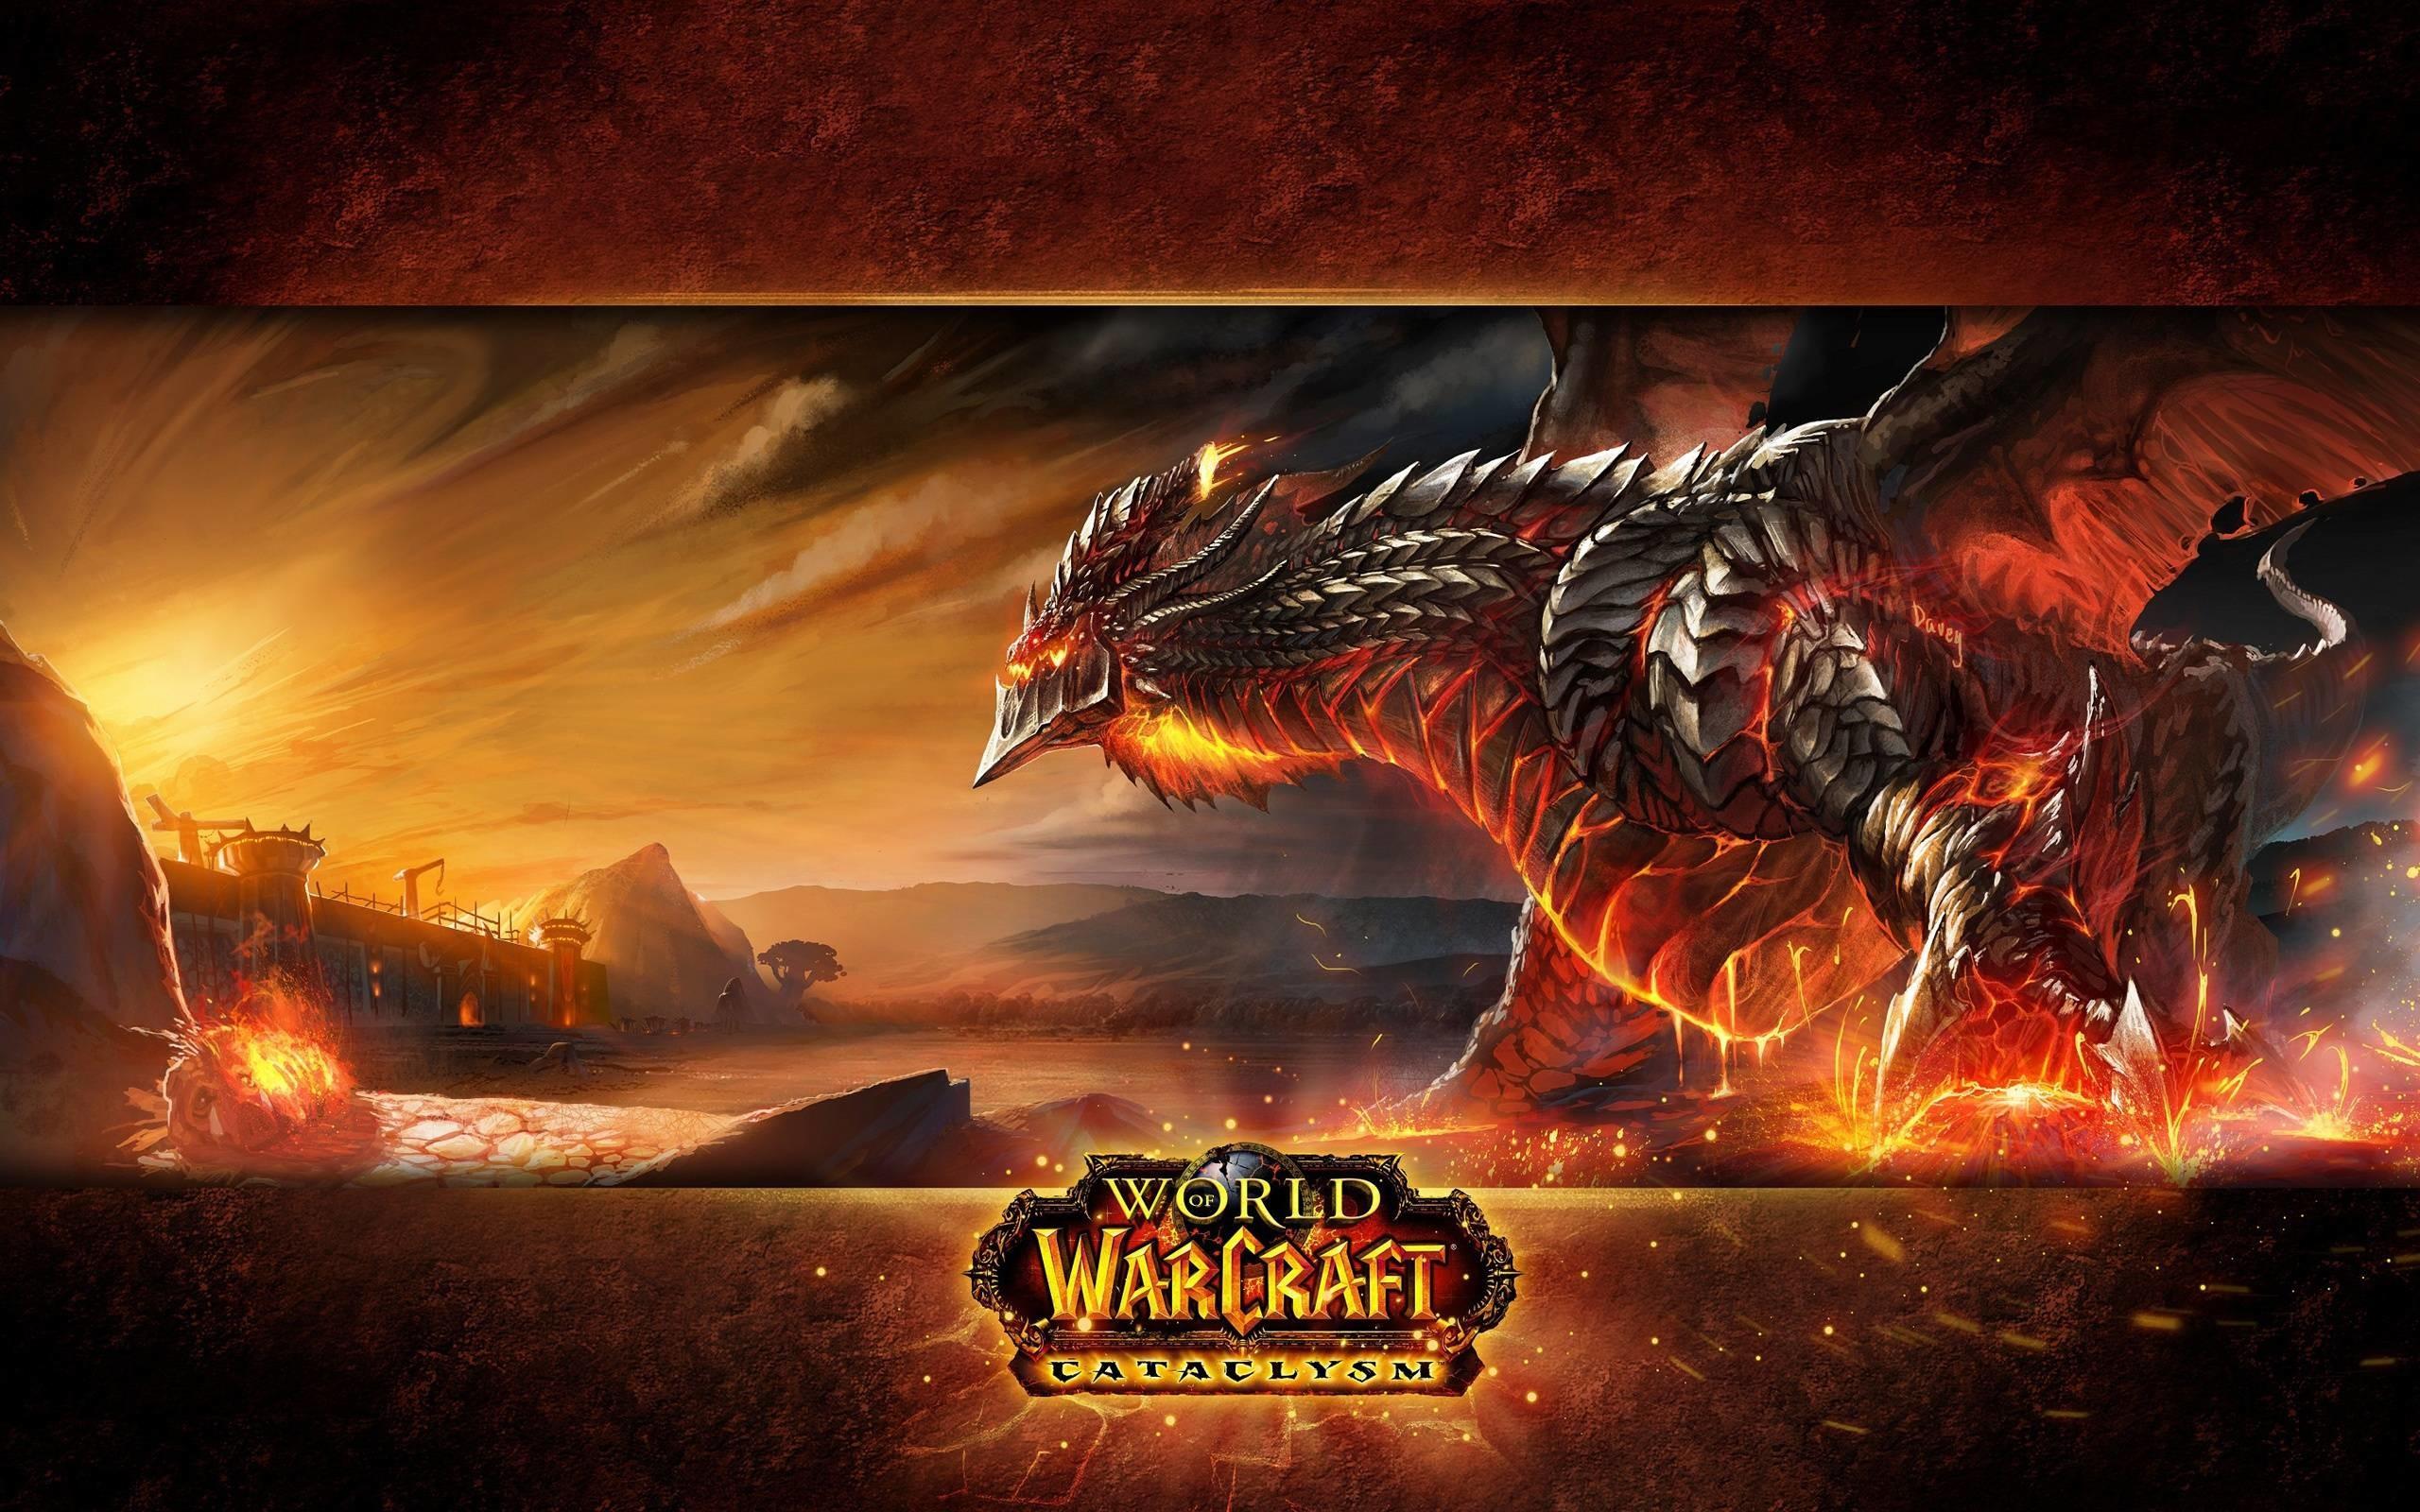 World Of Warcraft Hd X Hd Wallpaper